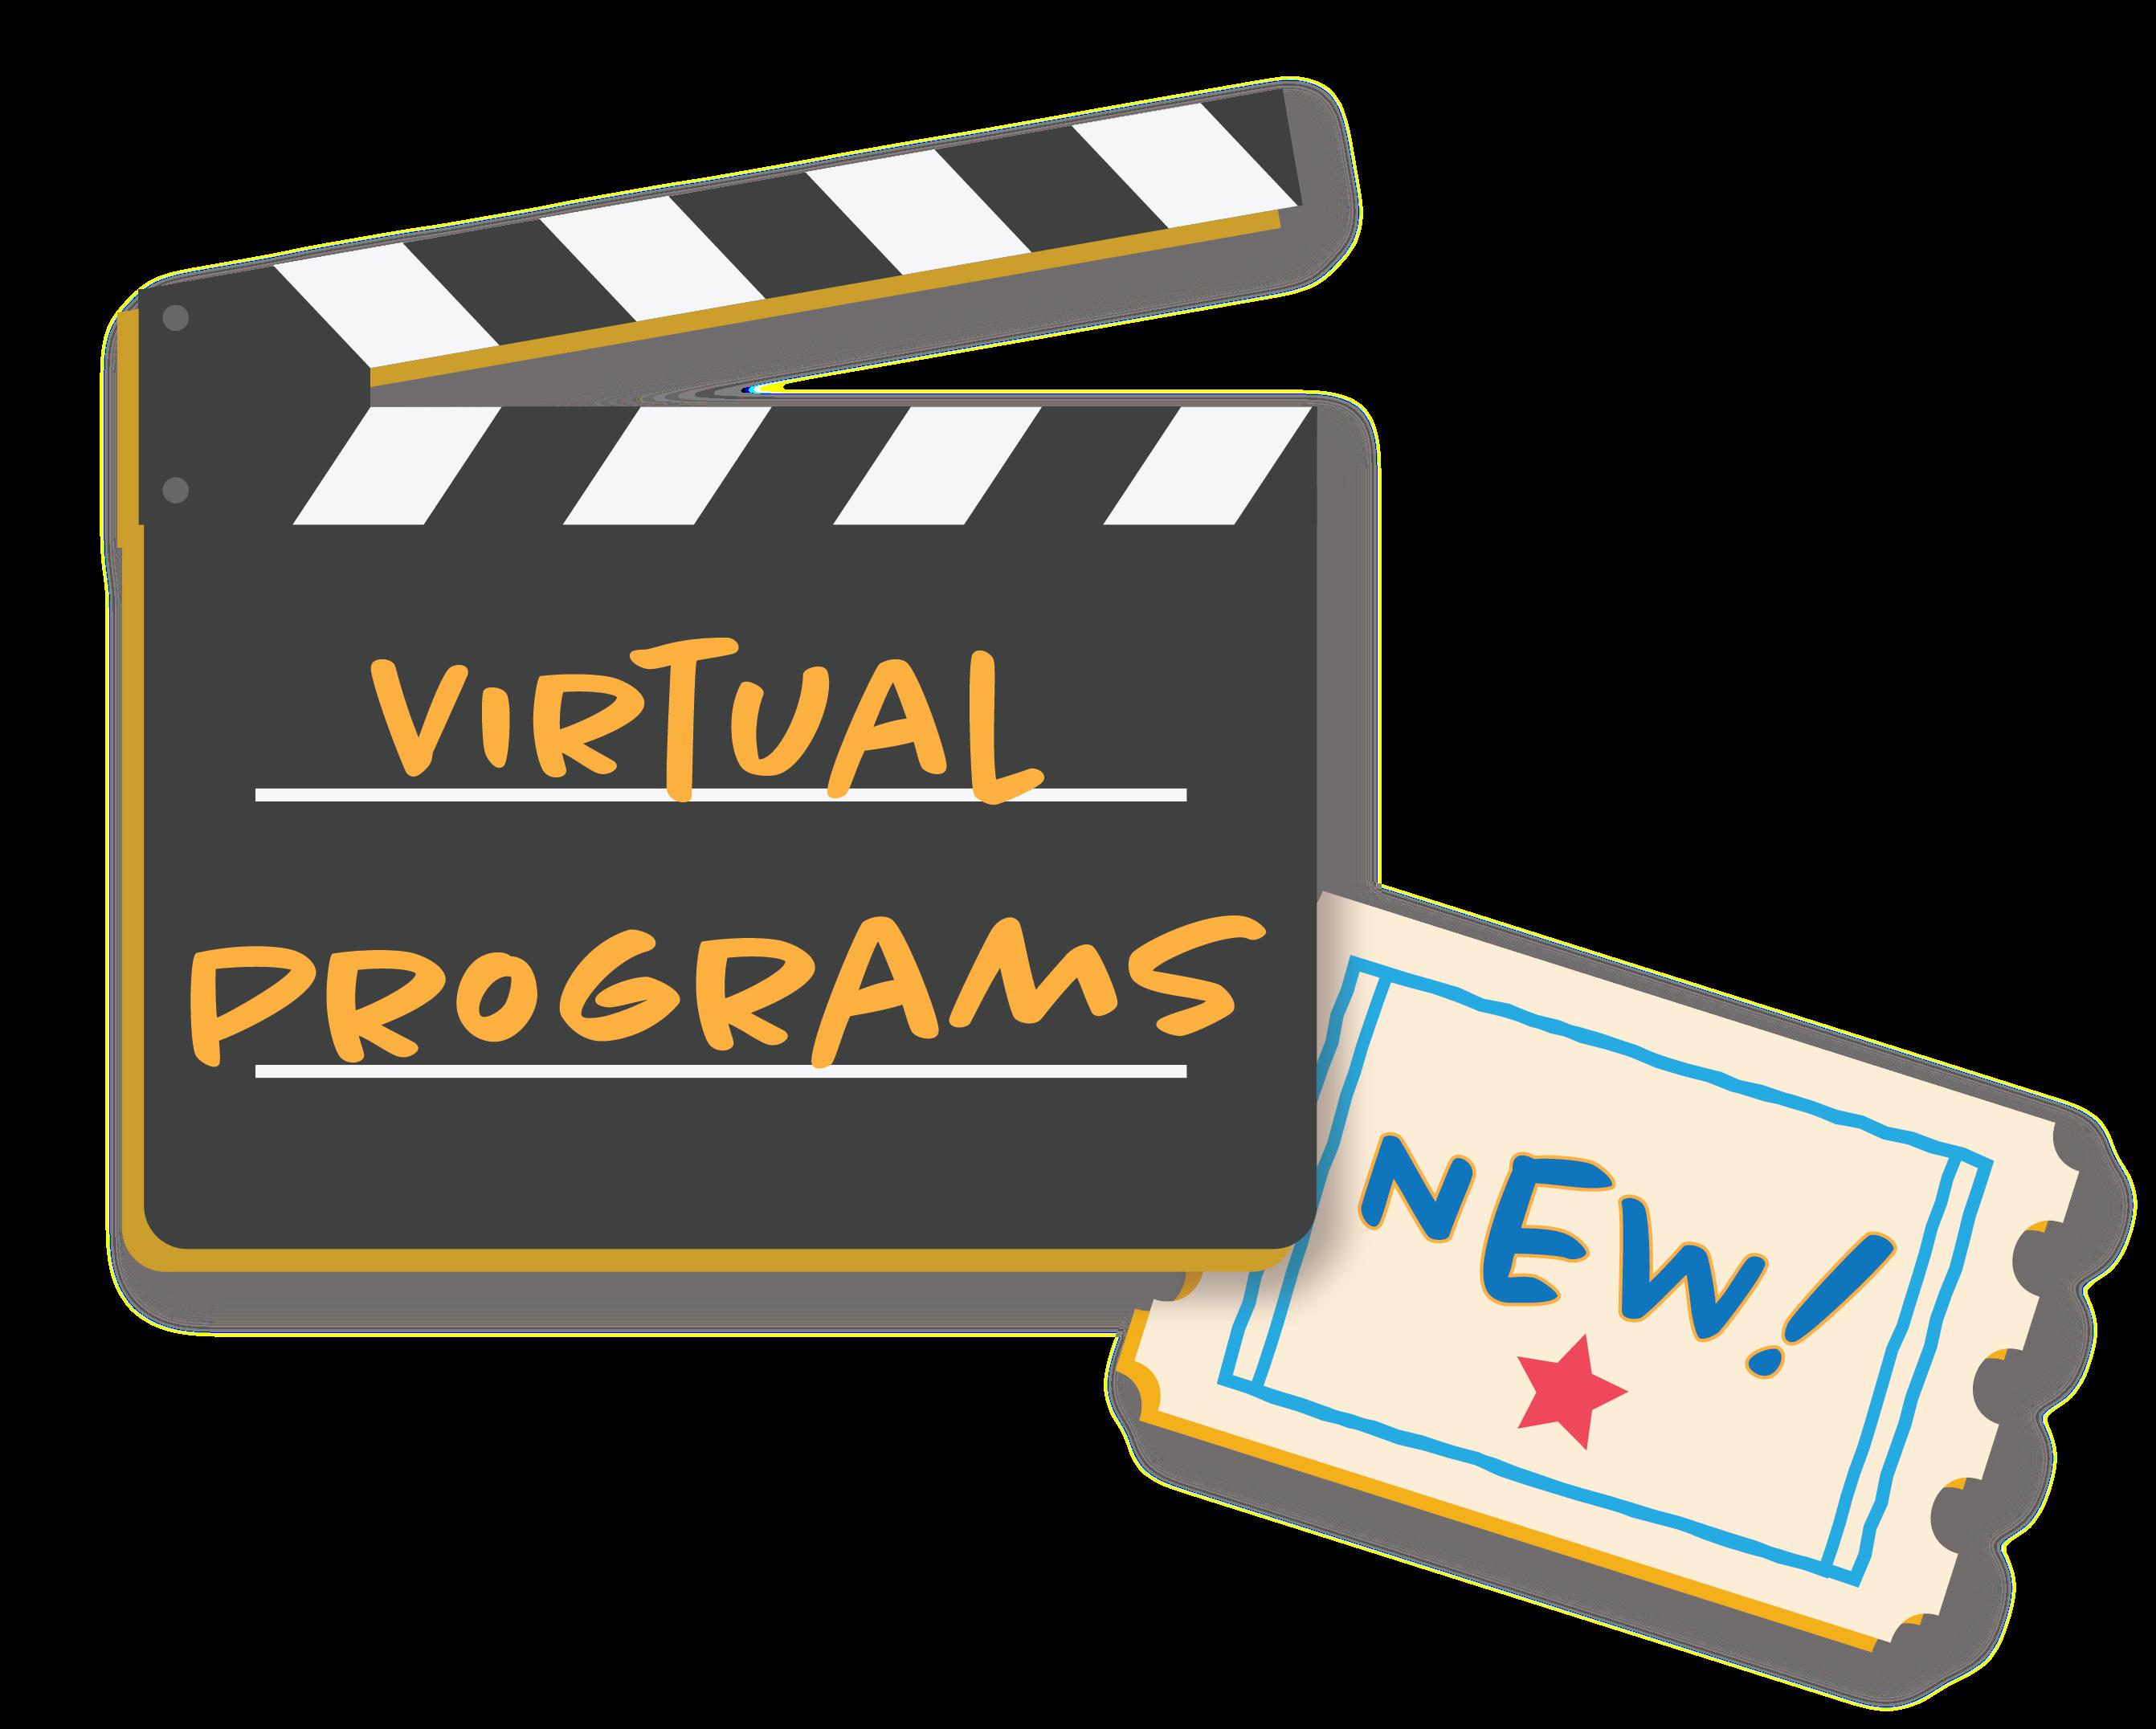 NBHS Virtual Program icon 09022020-01